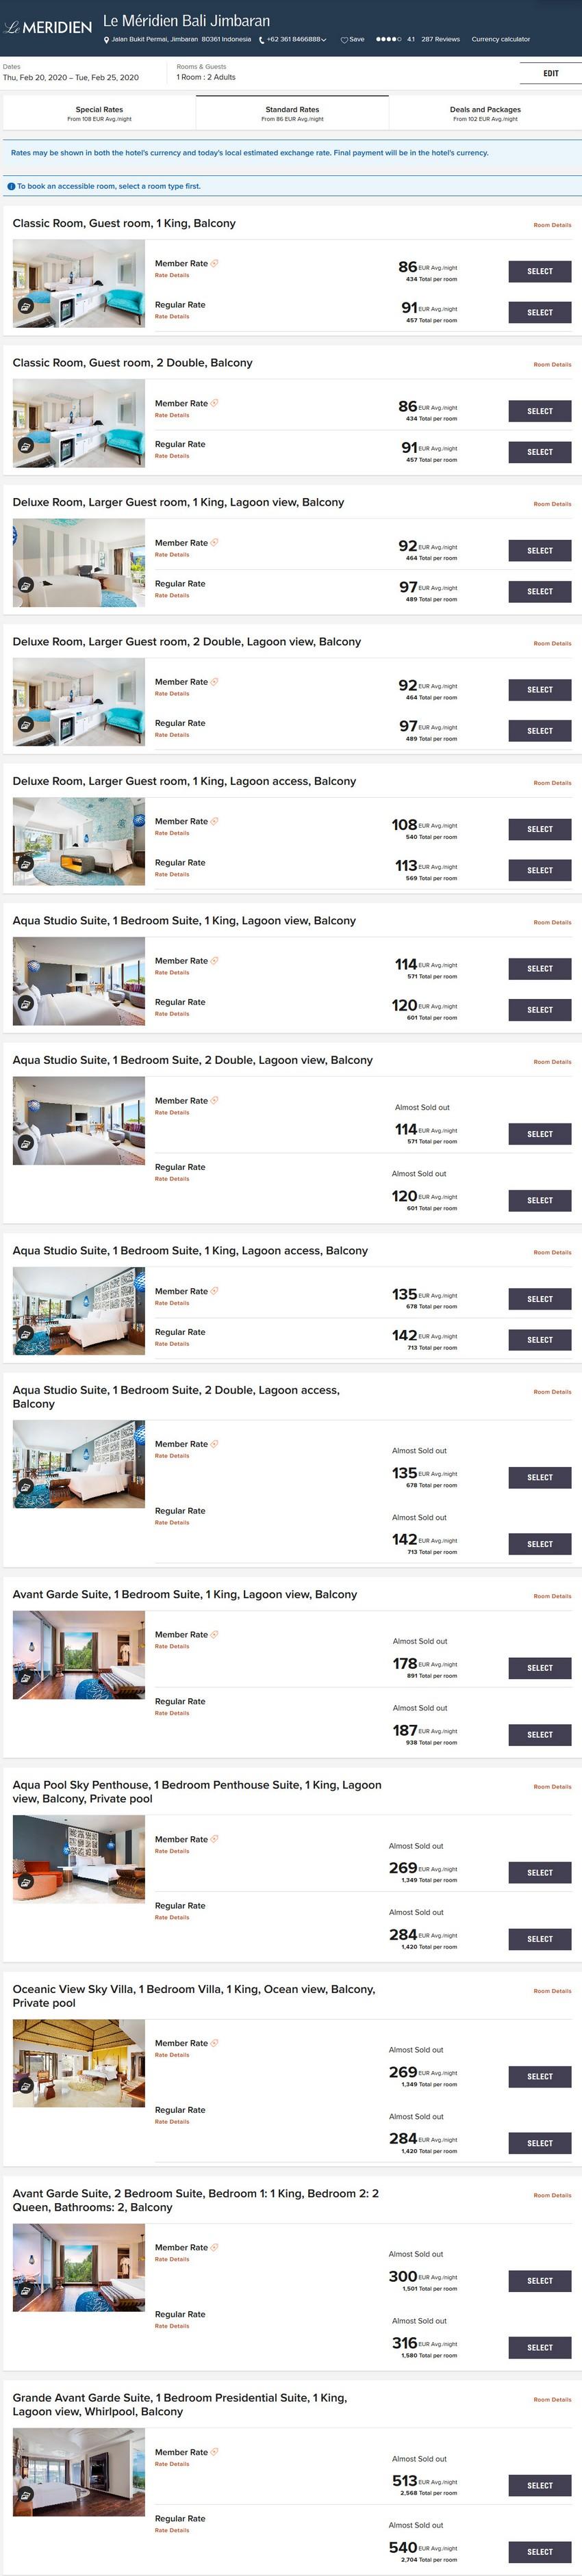 Vergleich Marriott Bonvoy Epic Stay Raten Le Meridien Jimbaran Bali